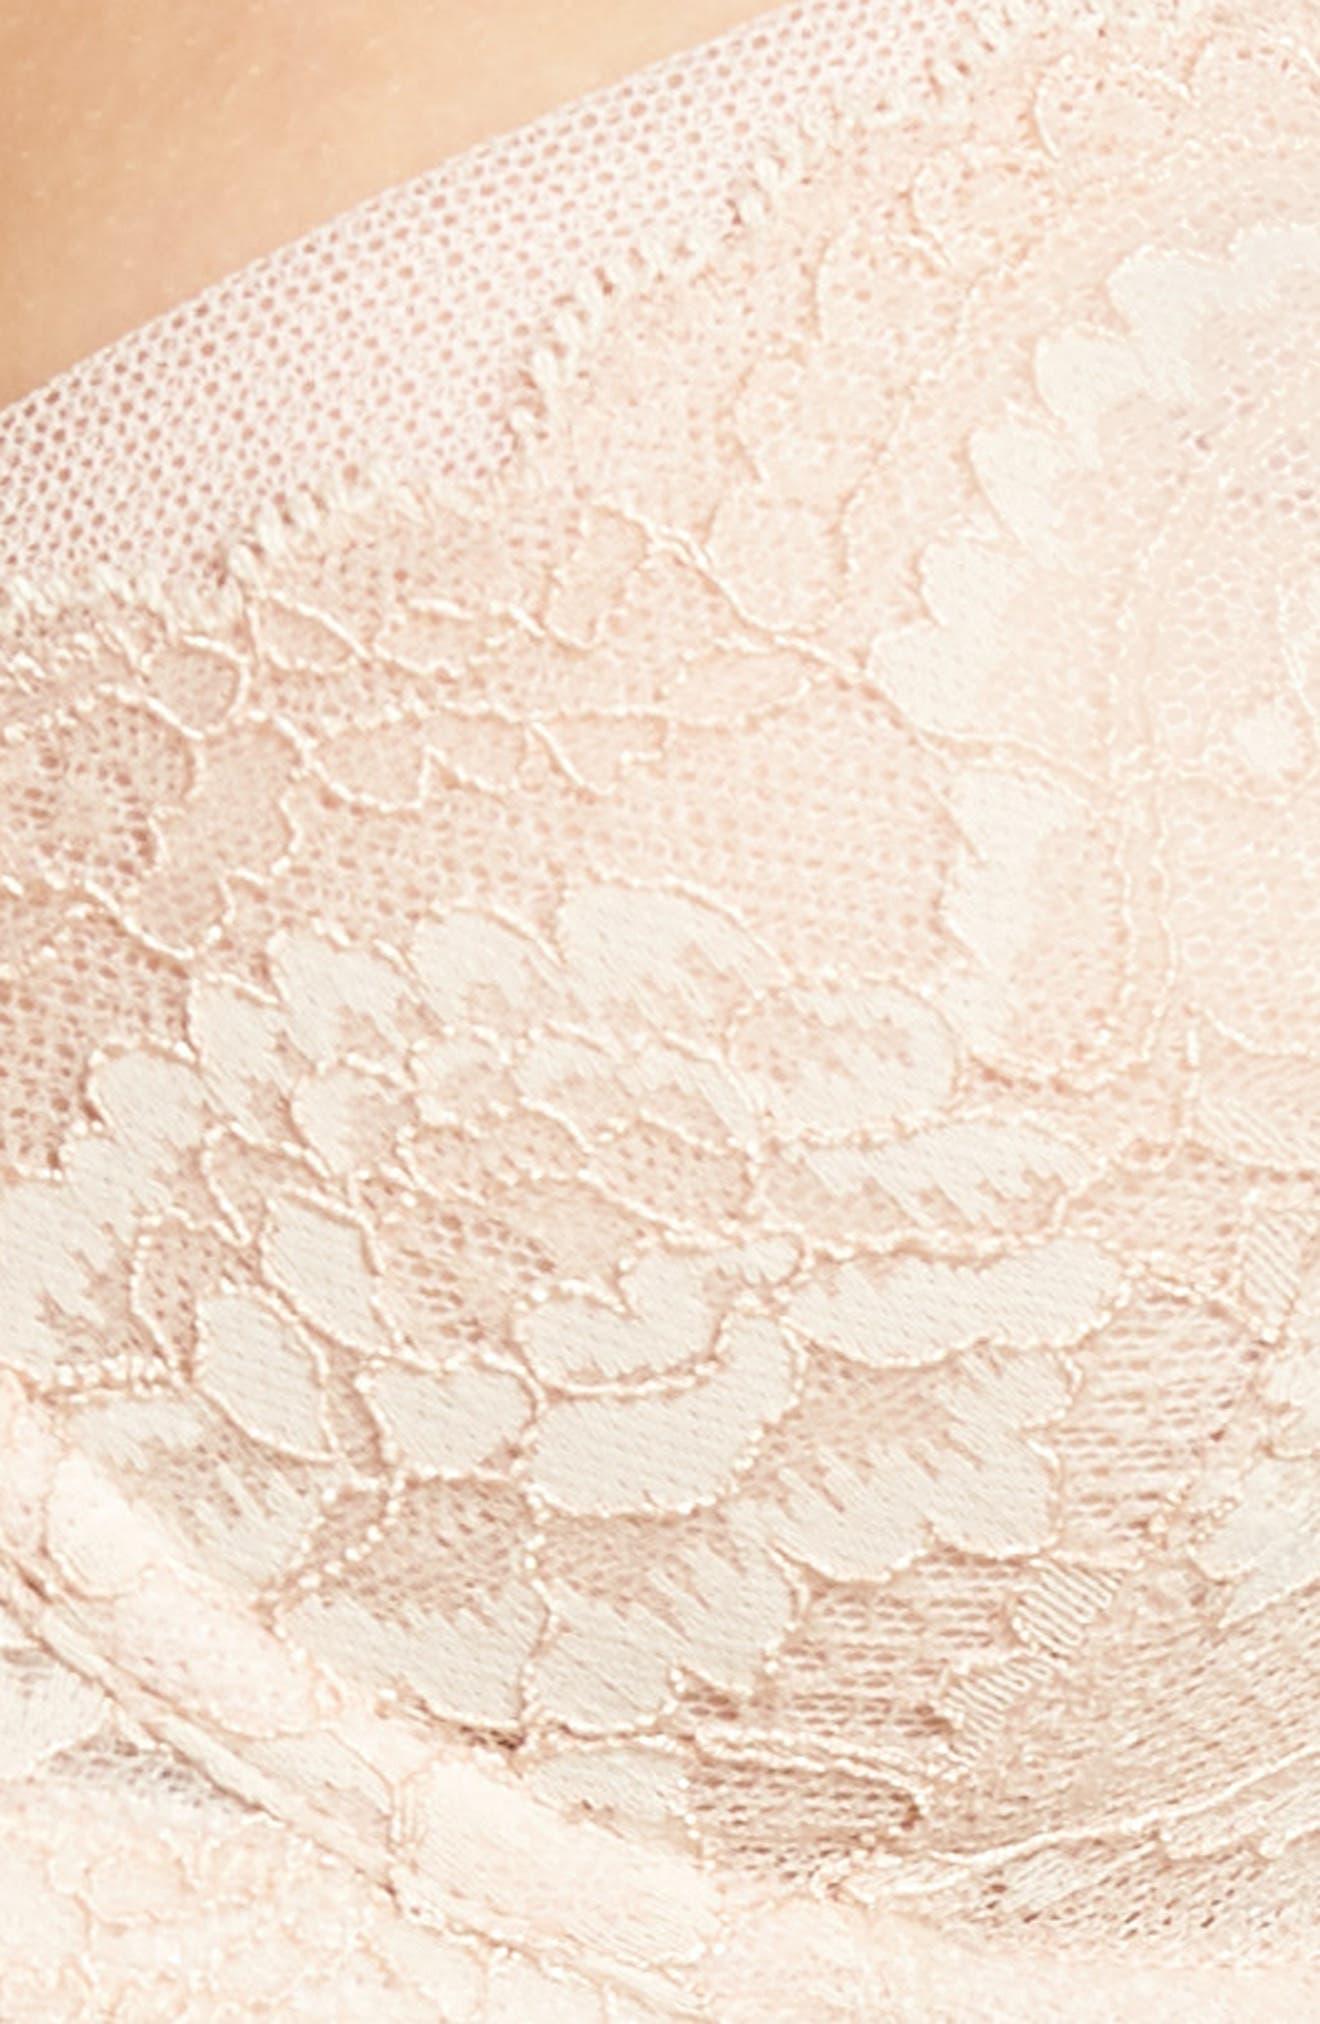 'Minx' Unlined Lace Demi Underwire Bra,                             Alternate thumbnail 5, color,                             Cashmere/ Blush